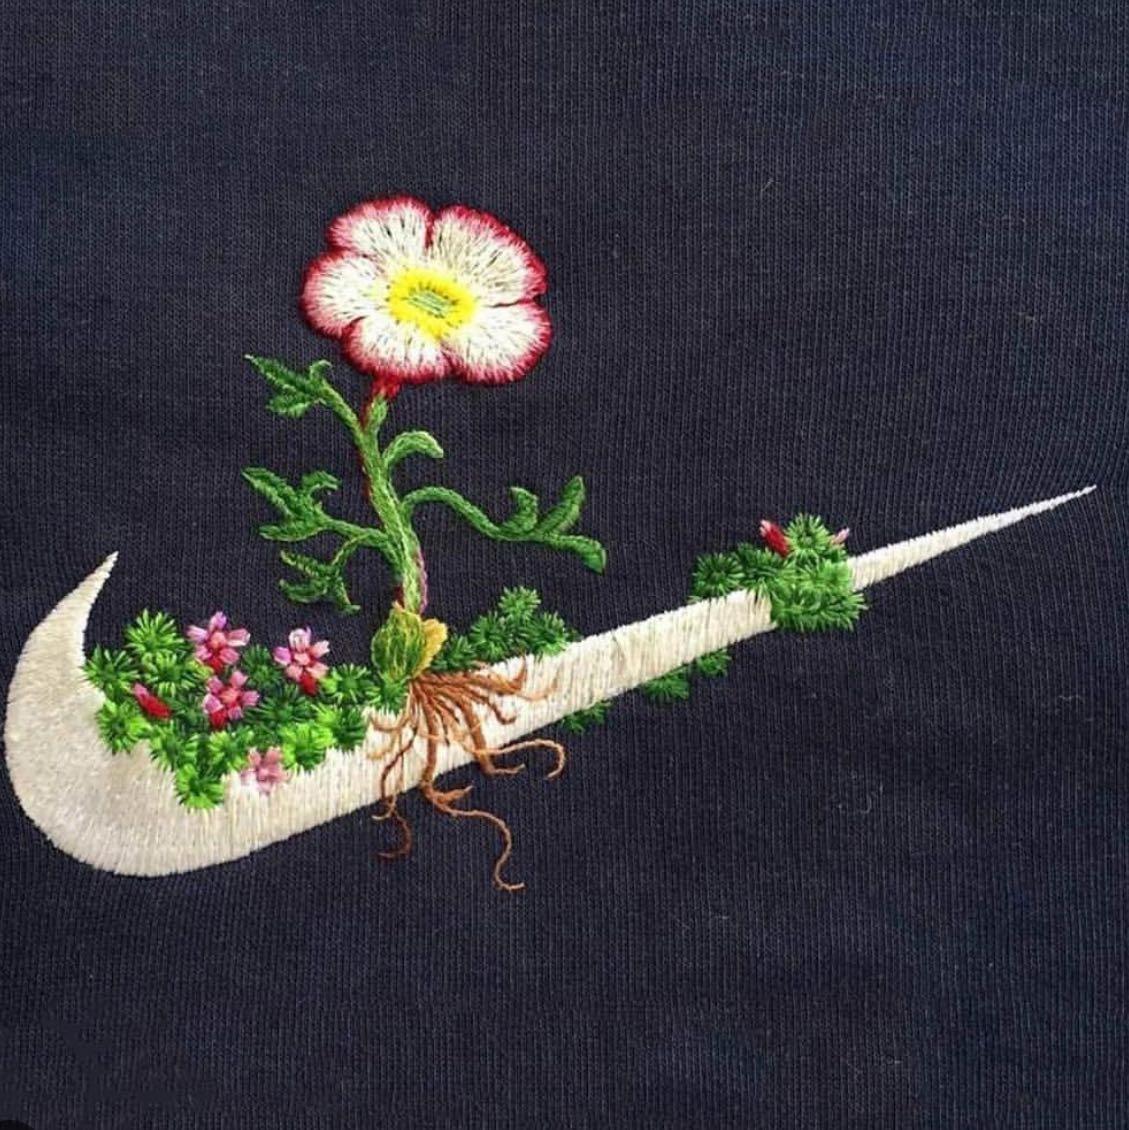 Вышивка логотипа гладью